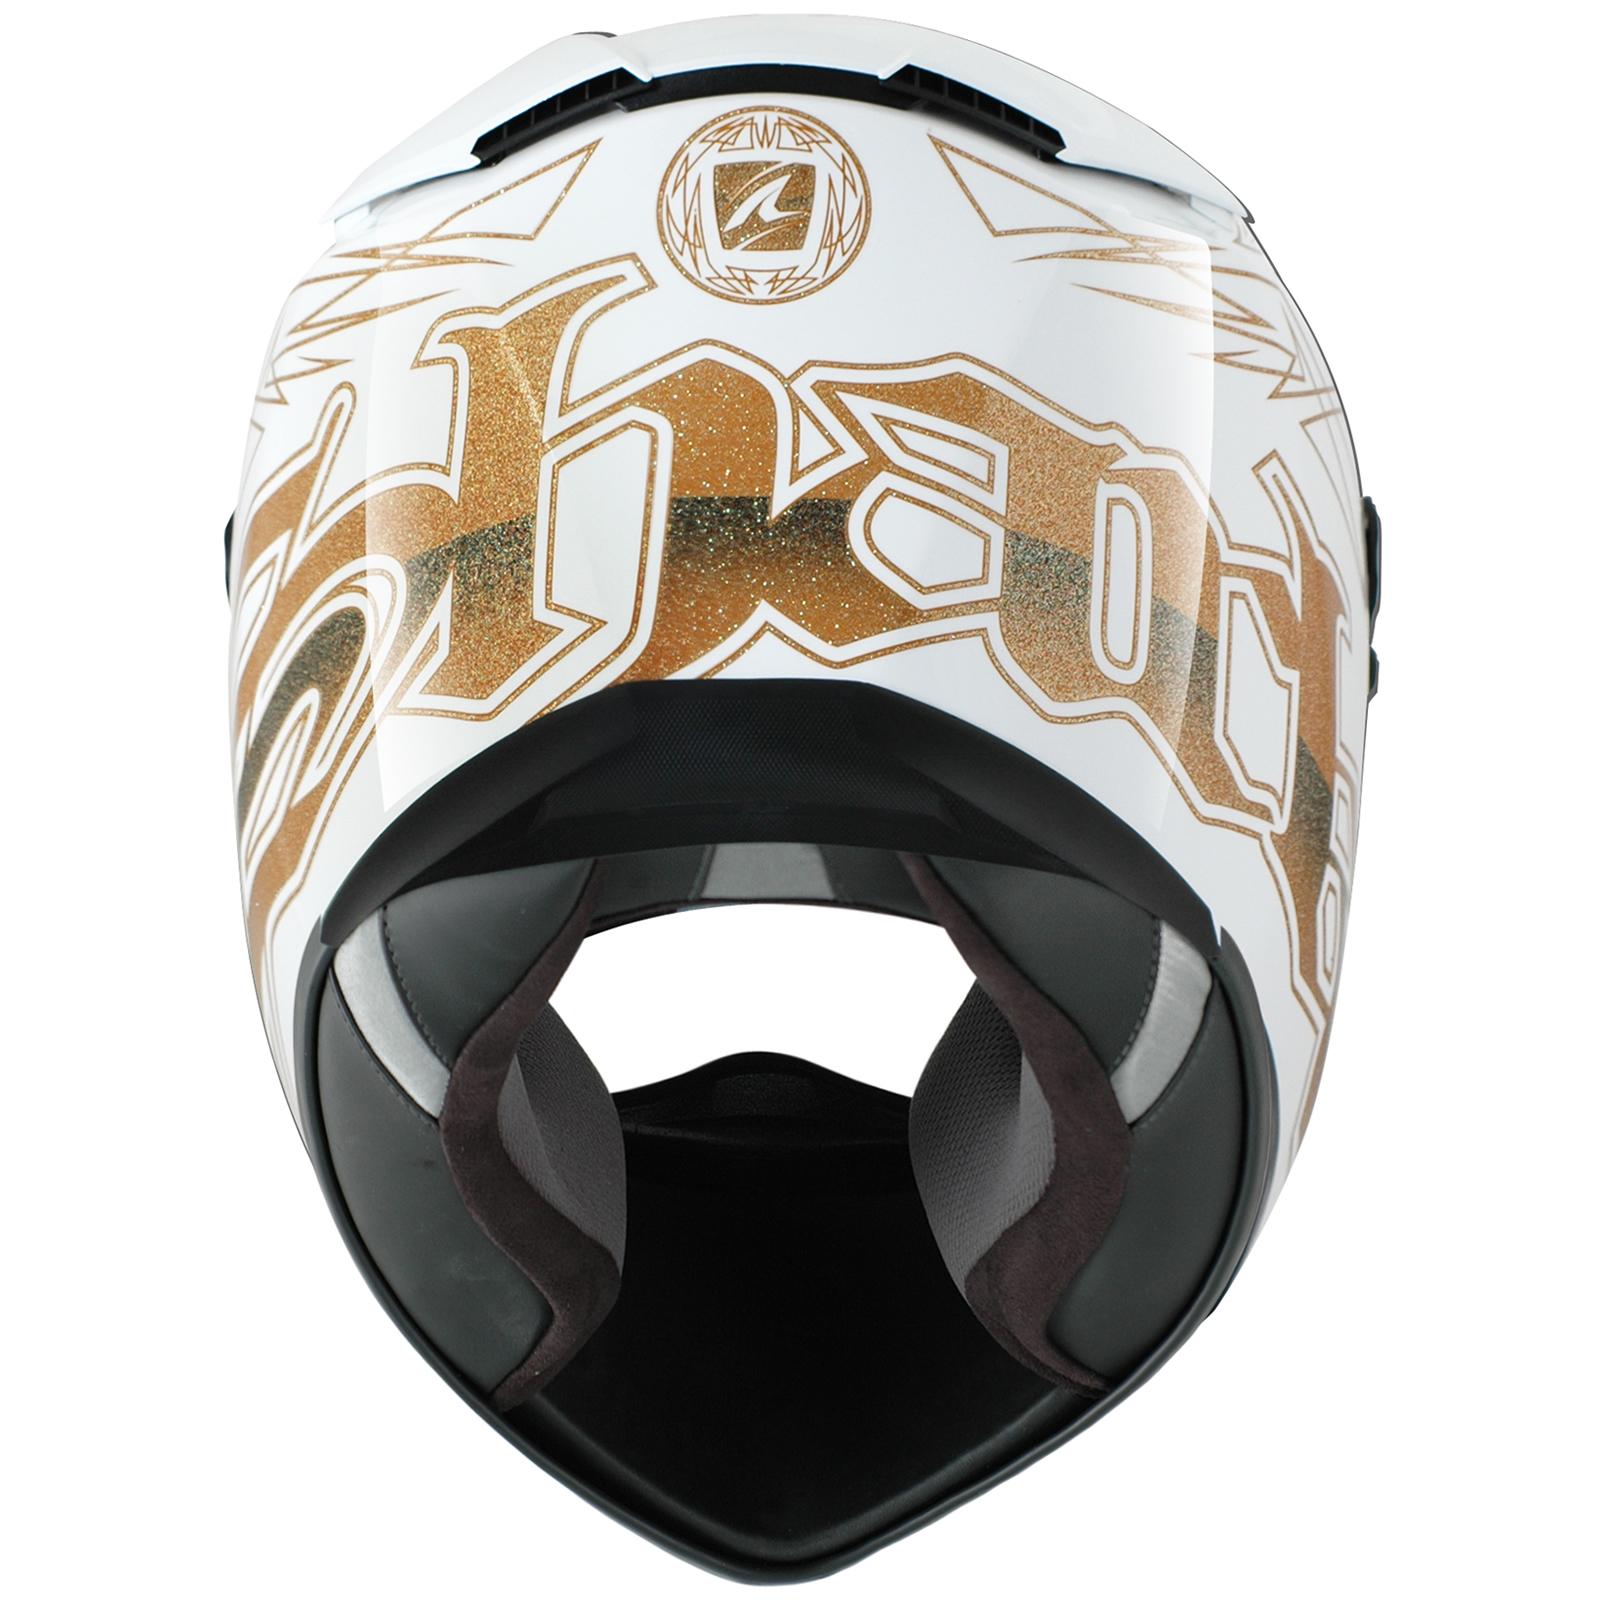 SHARK SPEED R EMBLEM TRIBAL FULL FACE GRAPHIC RACING  : Shark Speed R Emblem Motorcycle Helmet White 3 <strong>2005 Shoei Full Face</strong> Motorcycle Helmet Tribal Black from www.ebay.co.uk size 1600 x 1600 jpeg 935kB